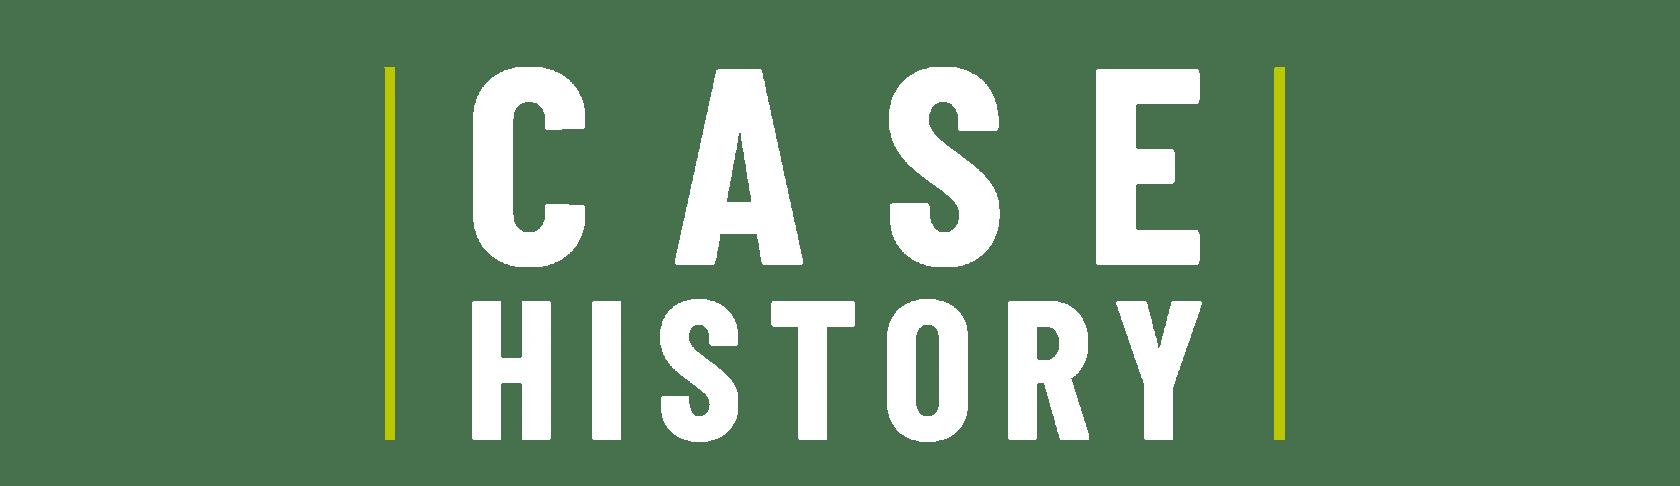 Header_Case_History_Tavola disegno 1